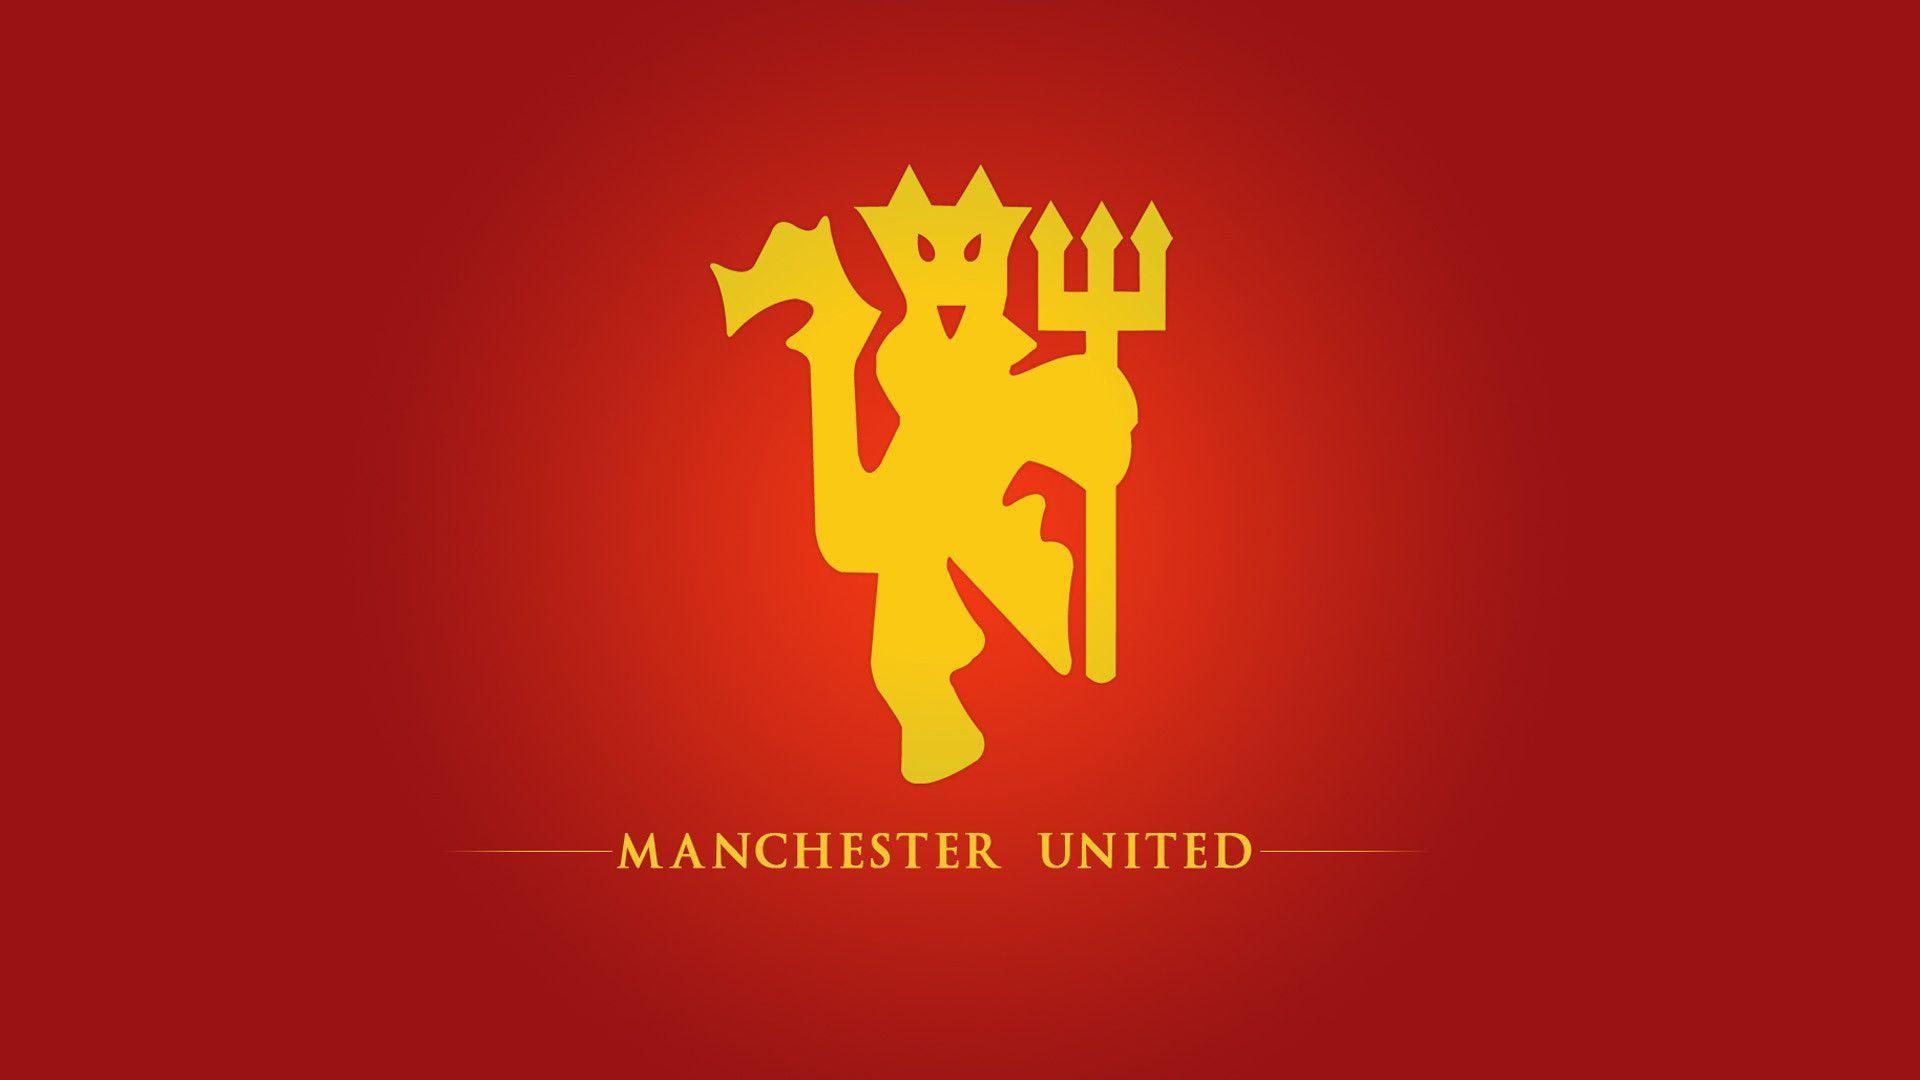 Manchester United Wallpaper Wallpaper Wa Manchester United